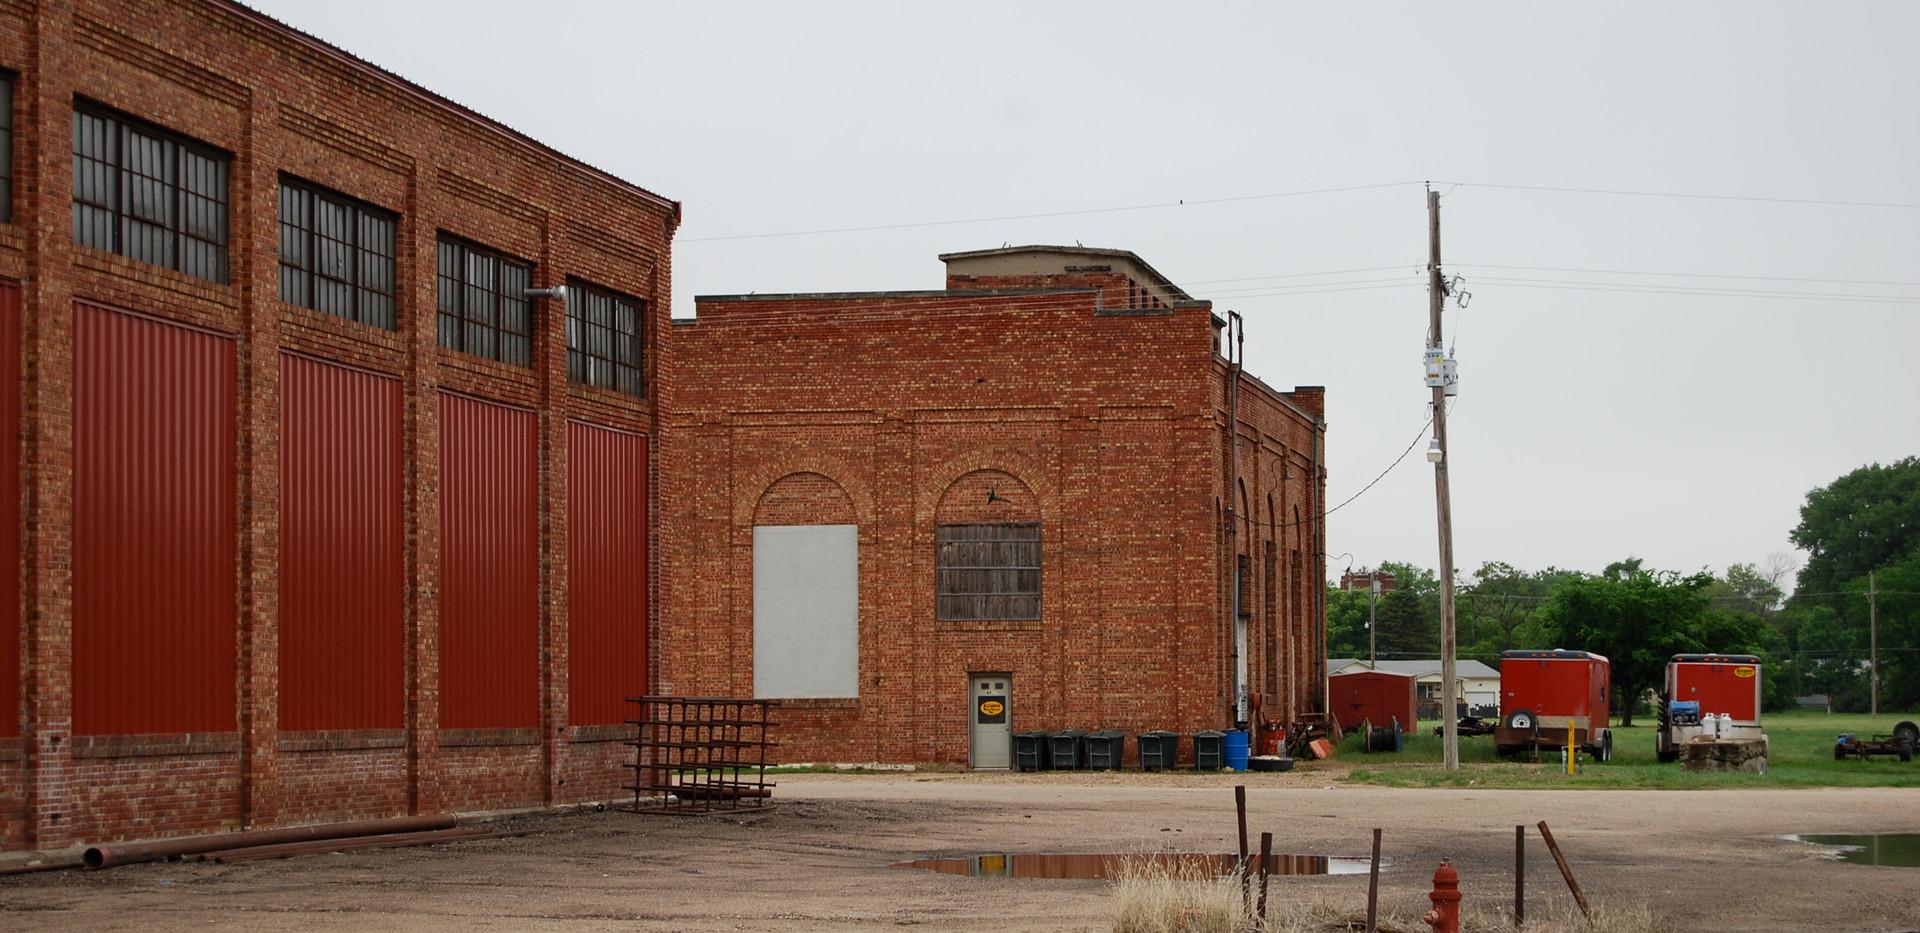 UP railroad shops